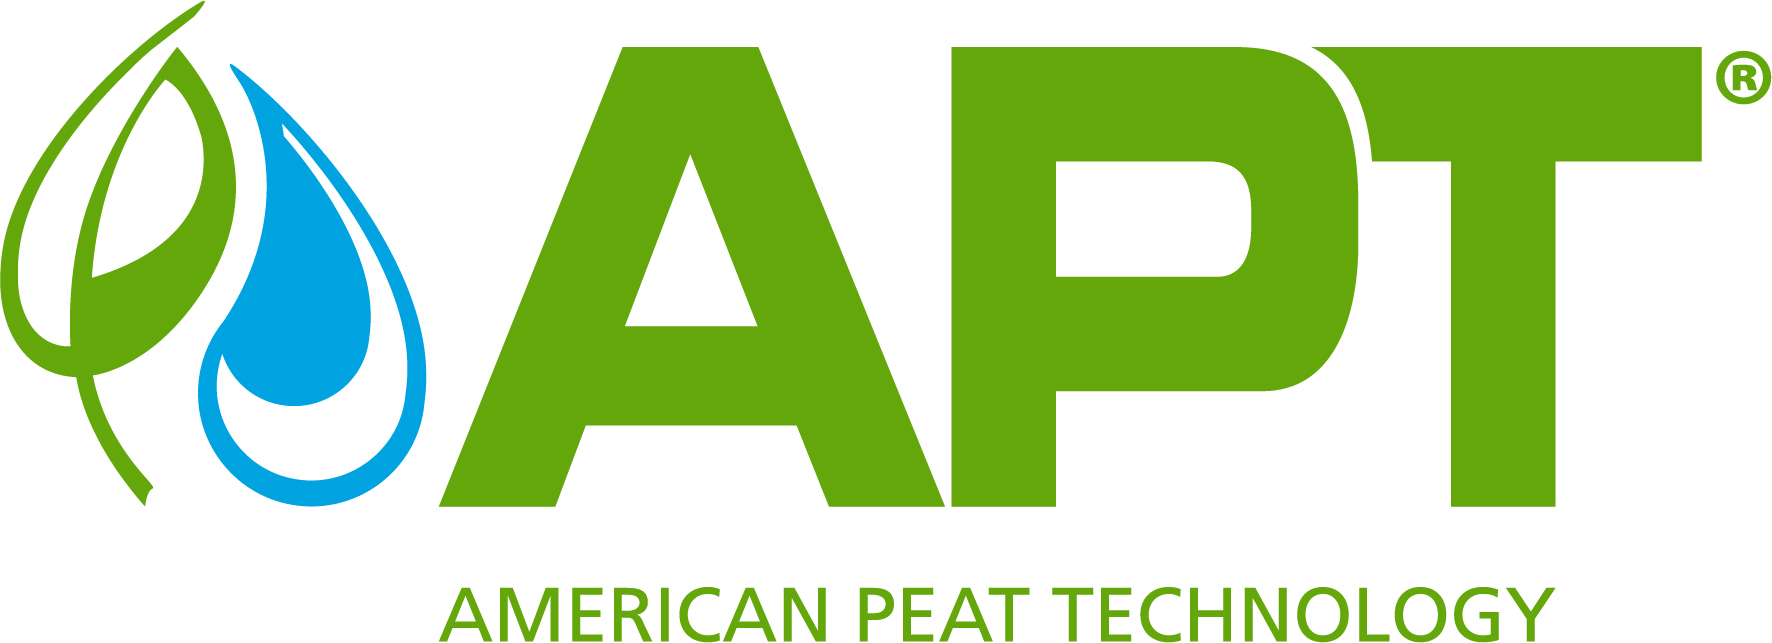 American Peat Technology Slide Image